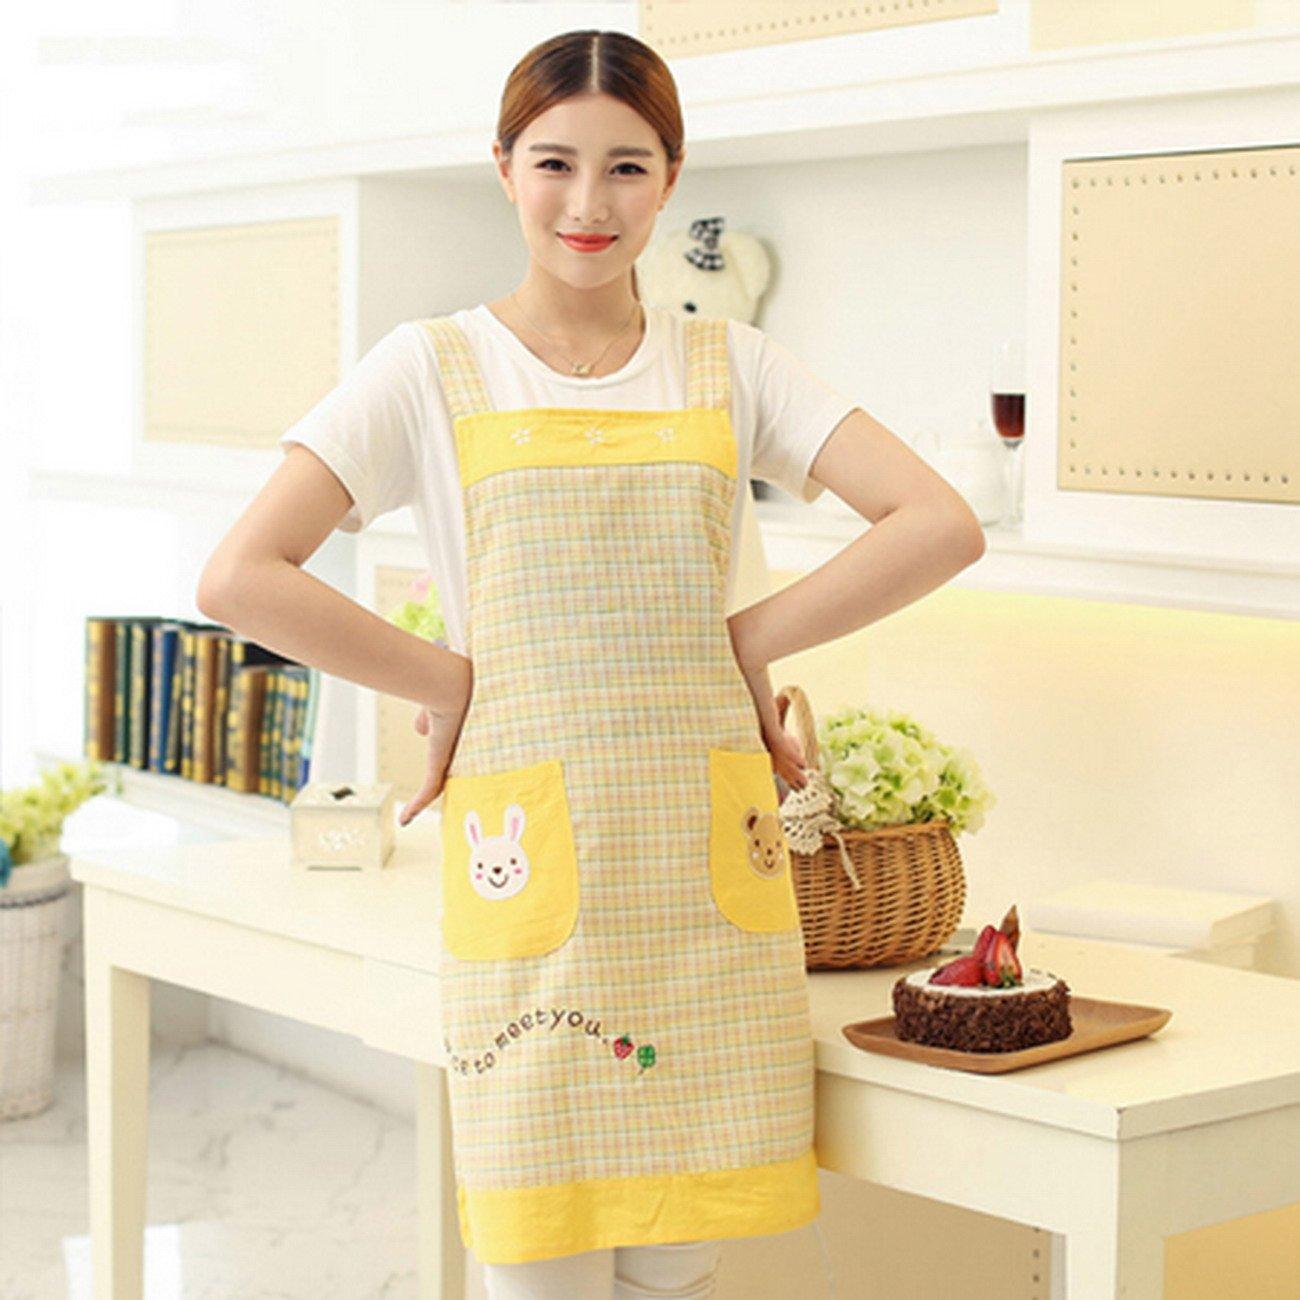 Geranjie Home Furnishingエプロンスカーフマニキュア韓国レストランキッチンエプロン幼稚園Overalls for Woman   B078RGV1HX